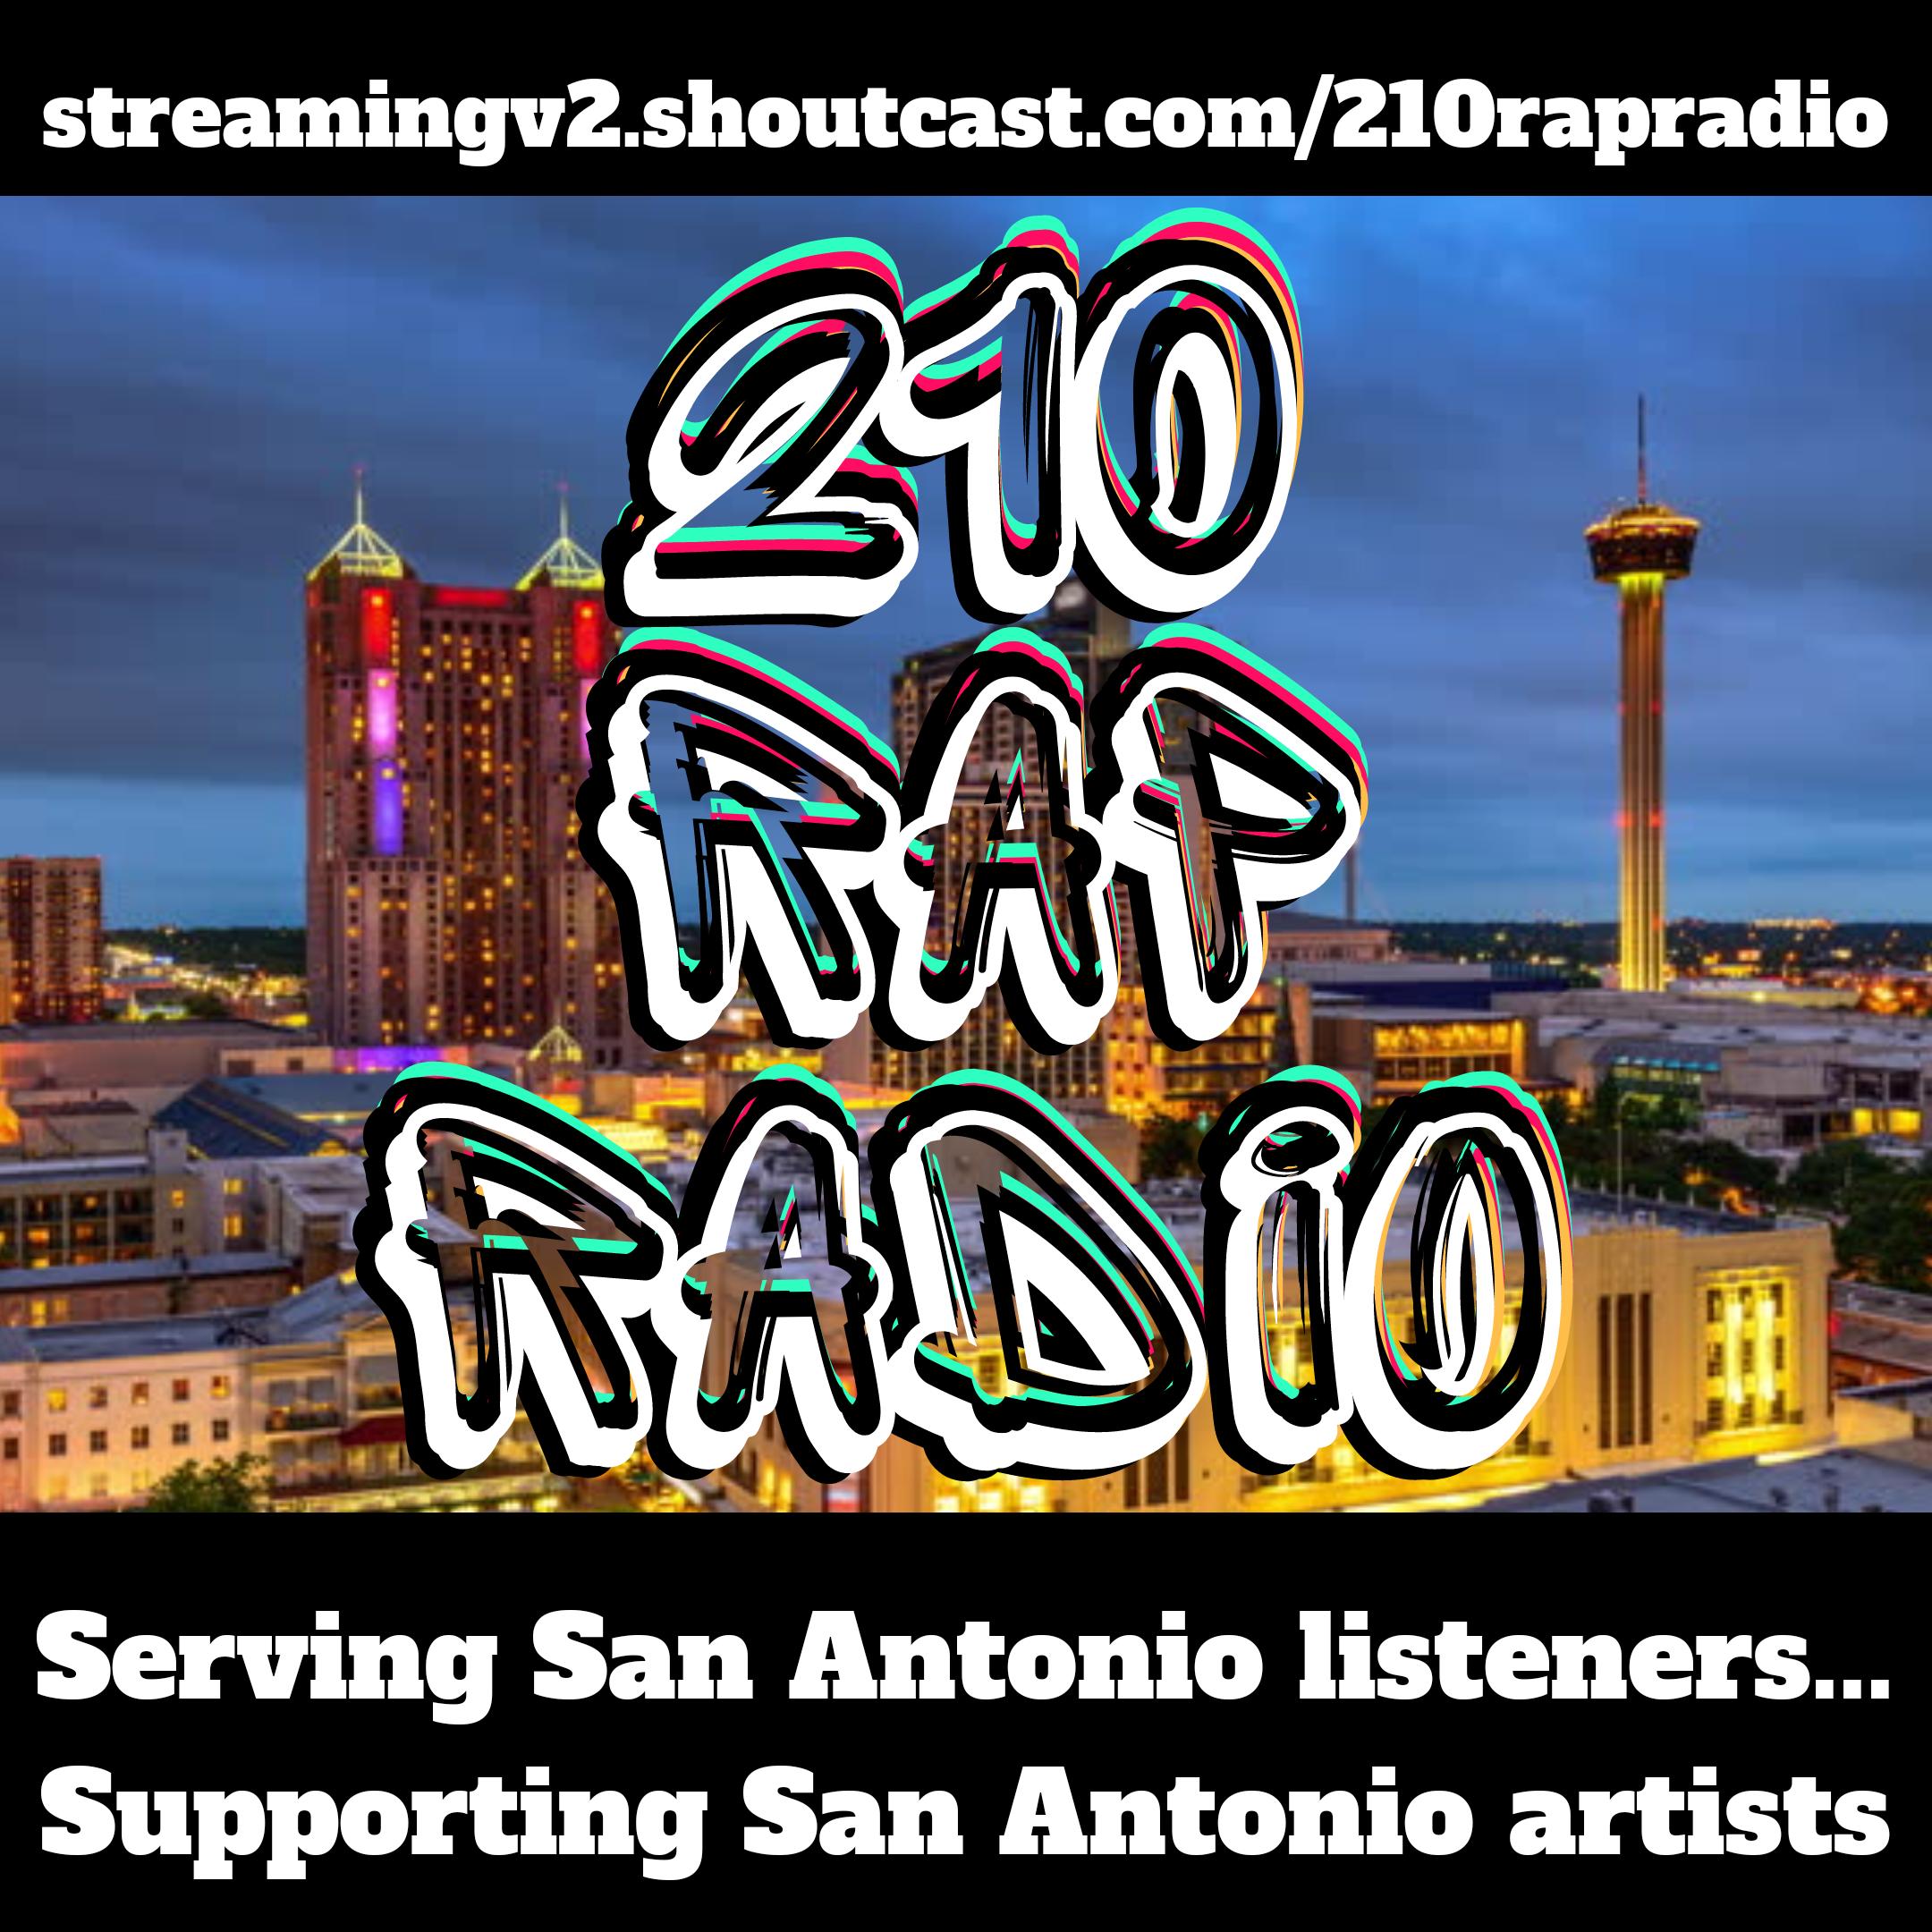 210RapRadio